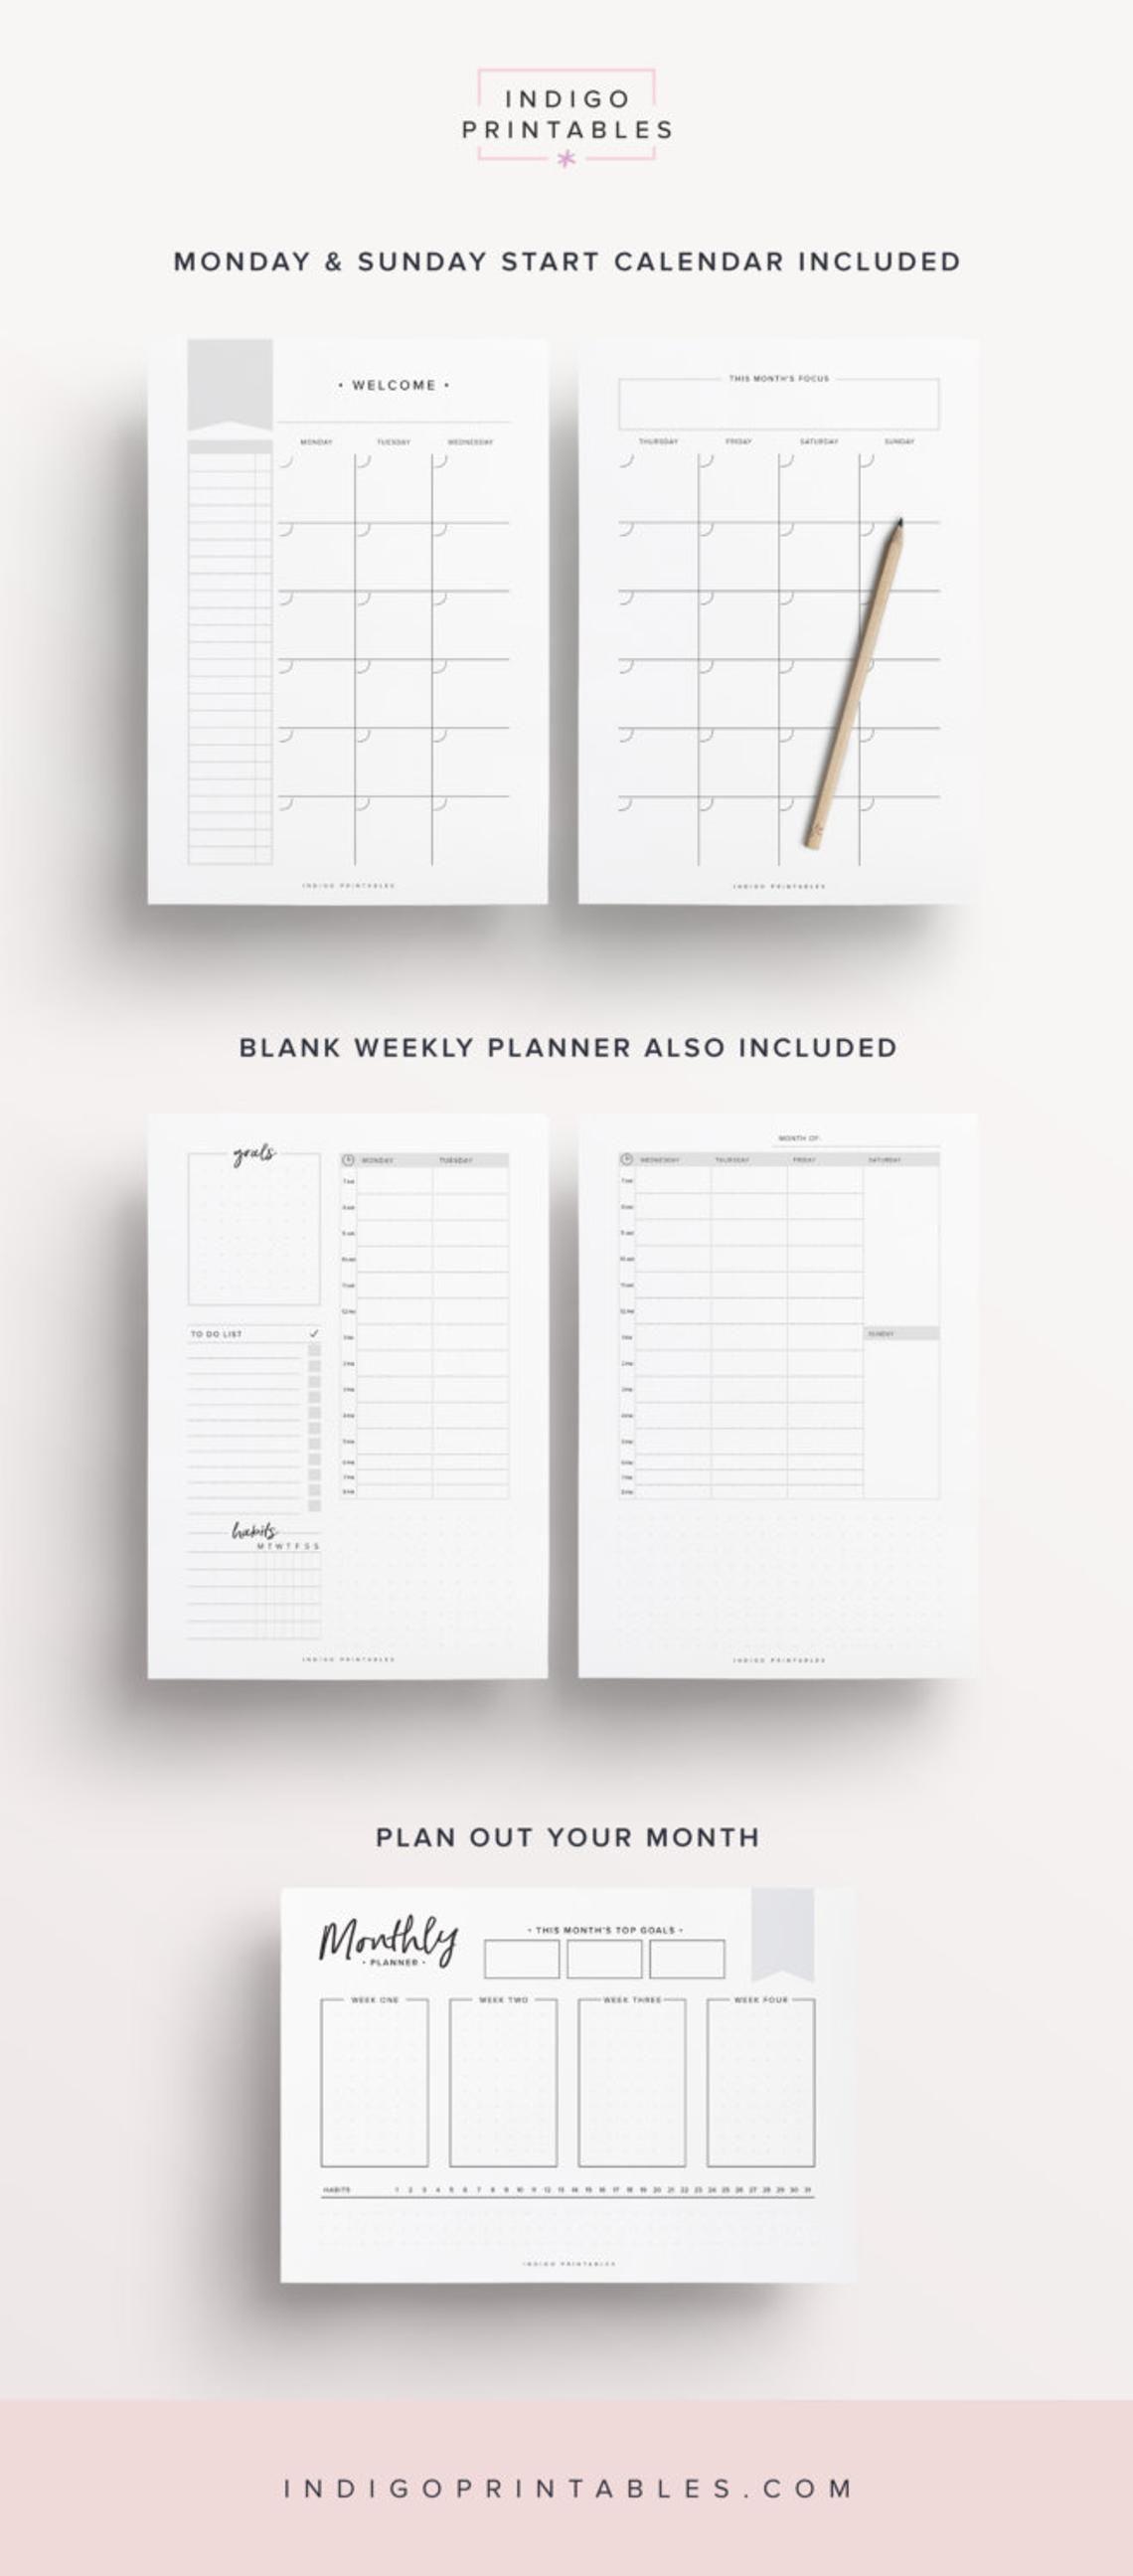 Productivity Planner Goal Planner Success Printable